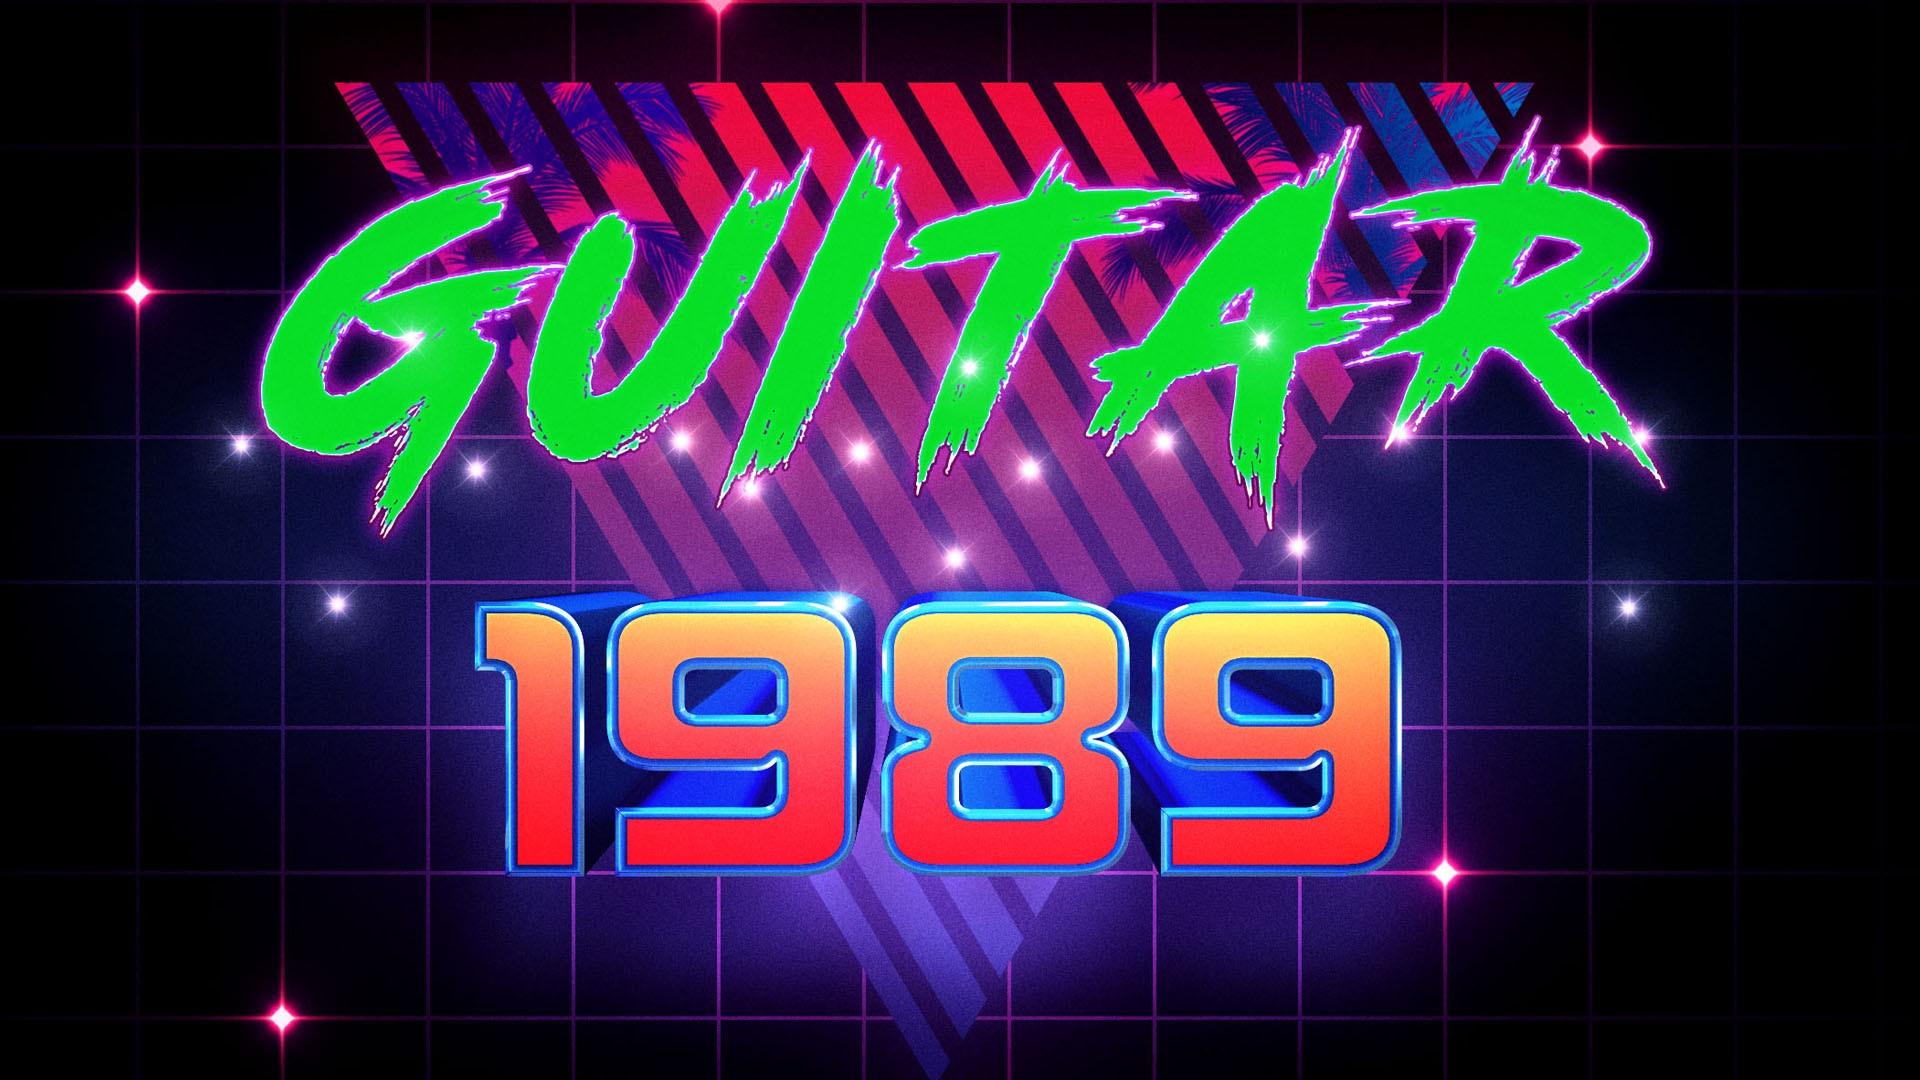 Guitar 1989 Main Title Thumb